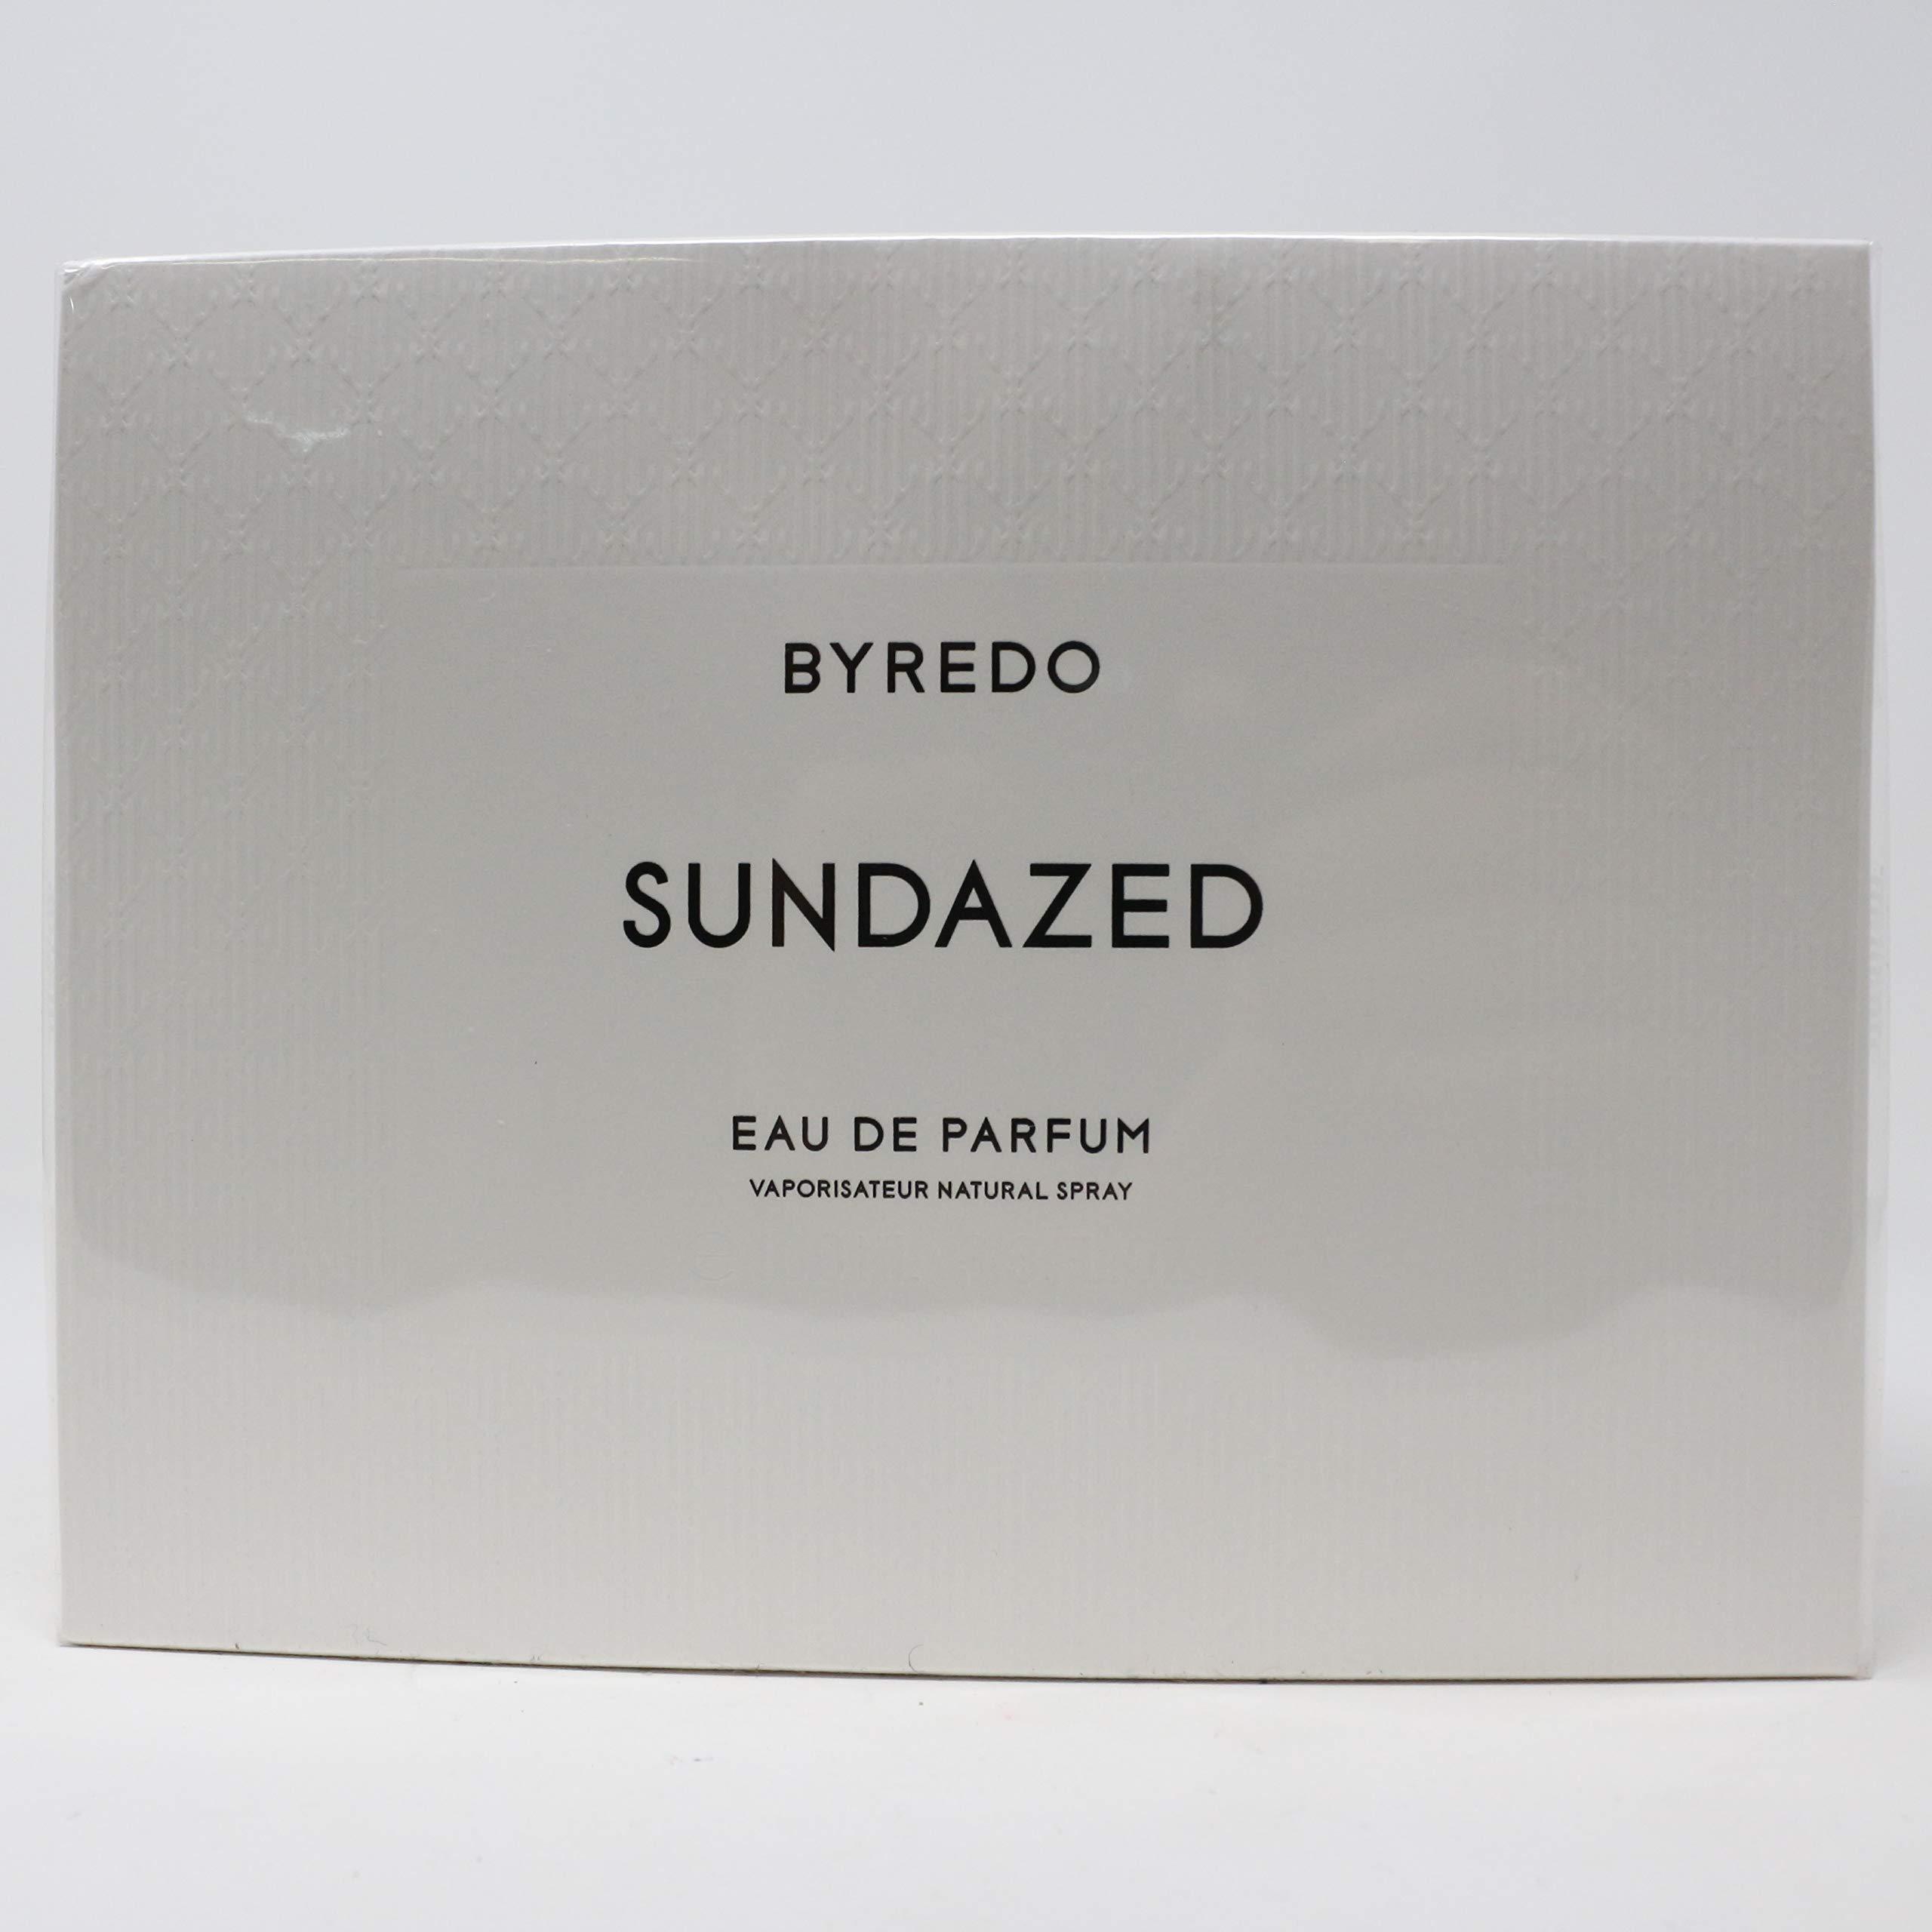 Byredo Sundazed Unisex Eau de Perfume, 100 ml